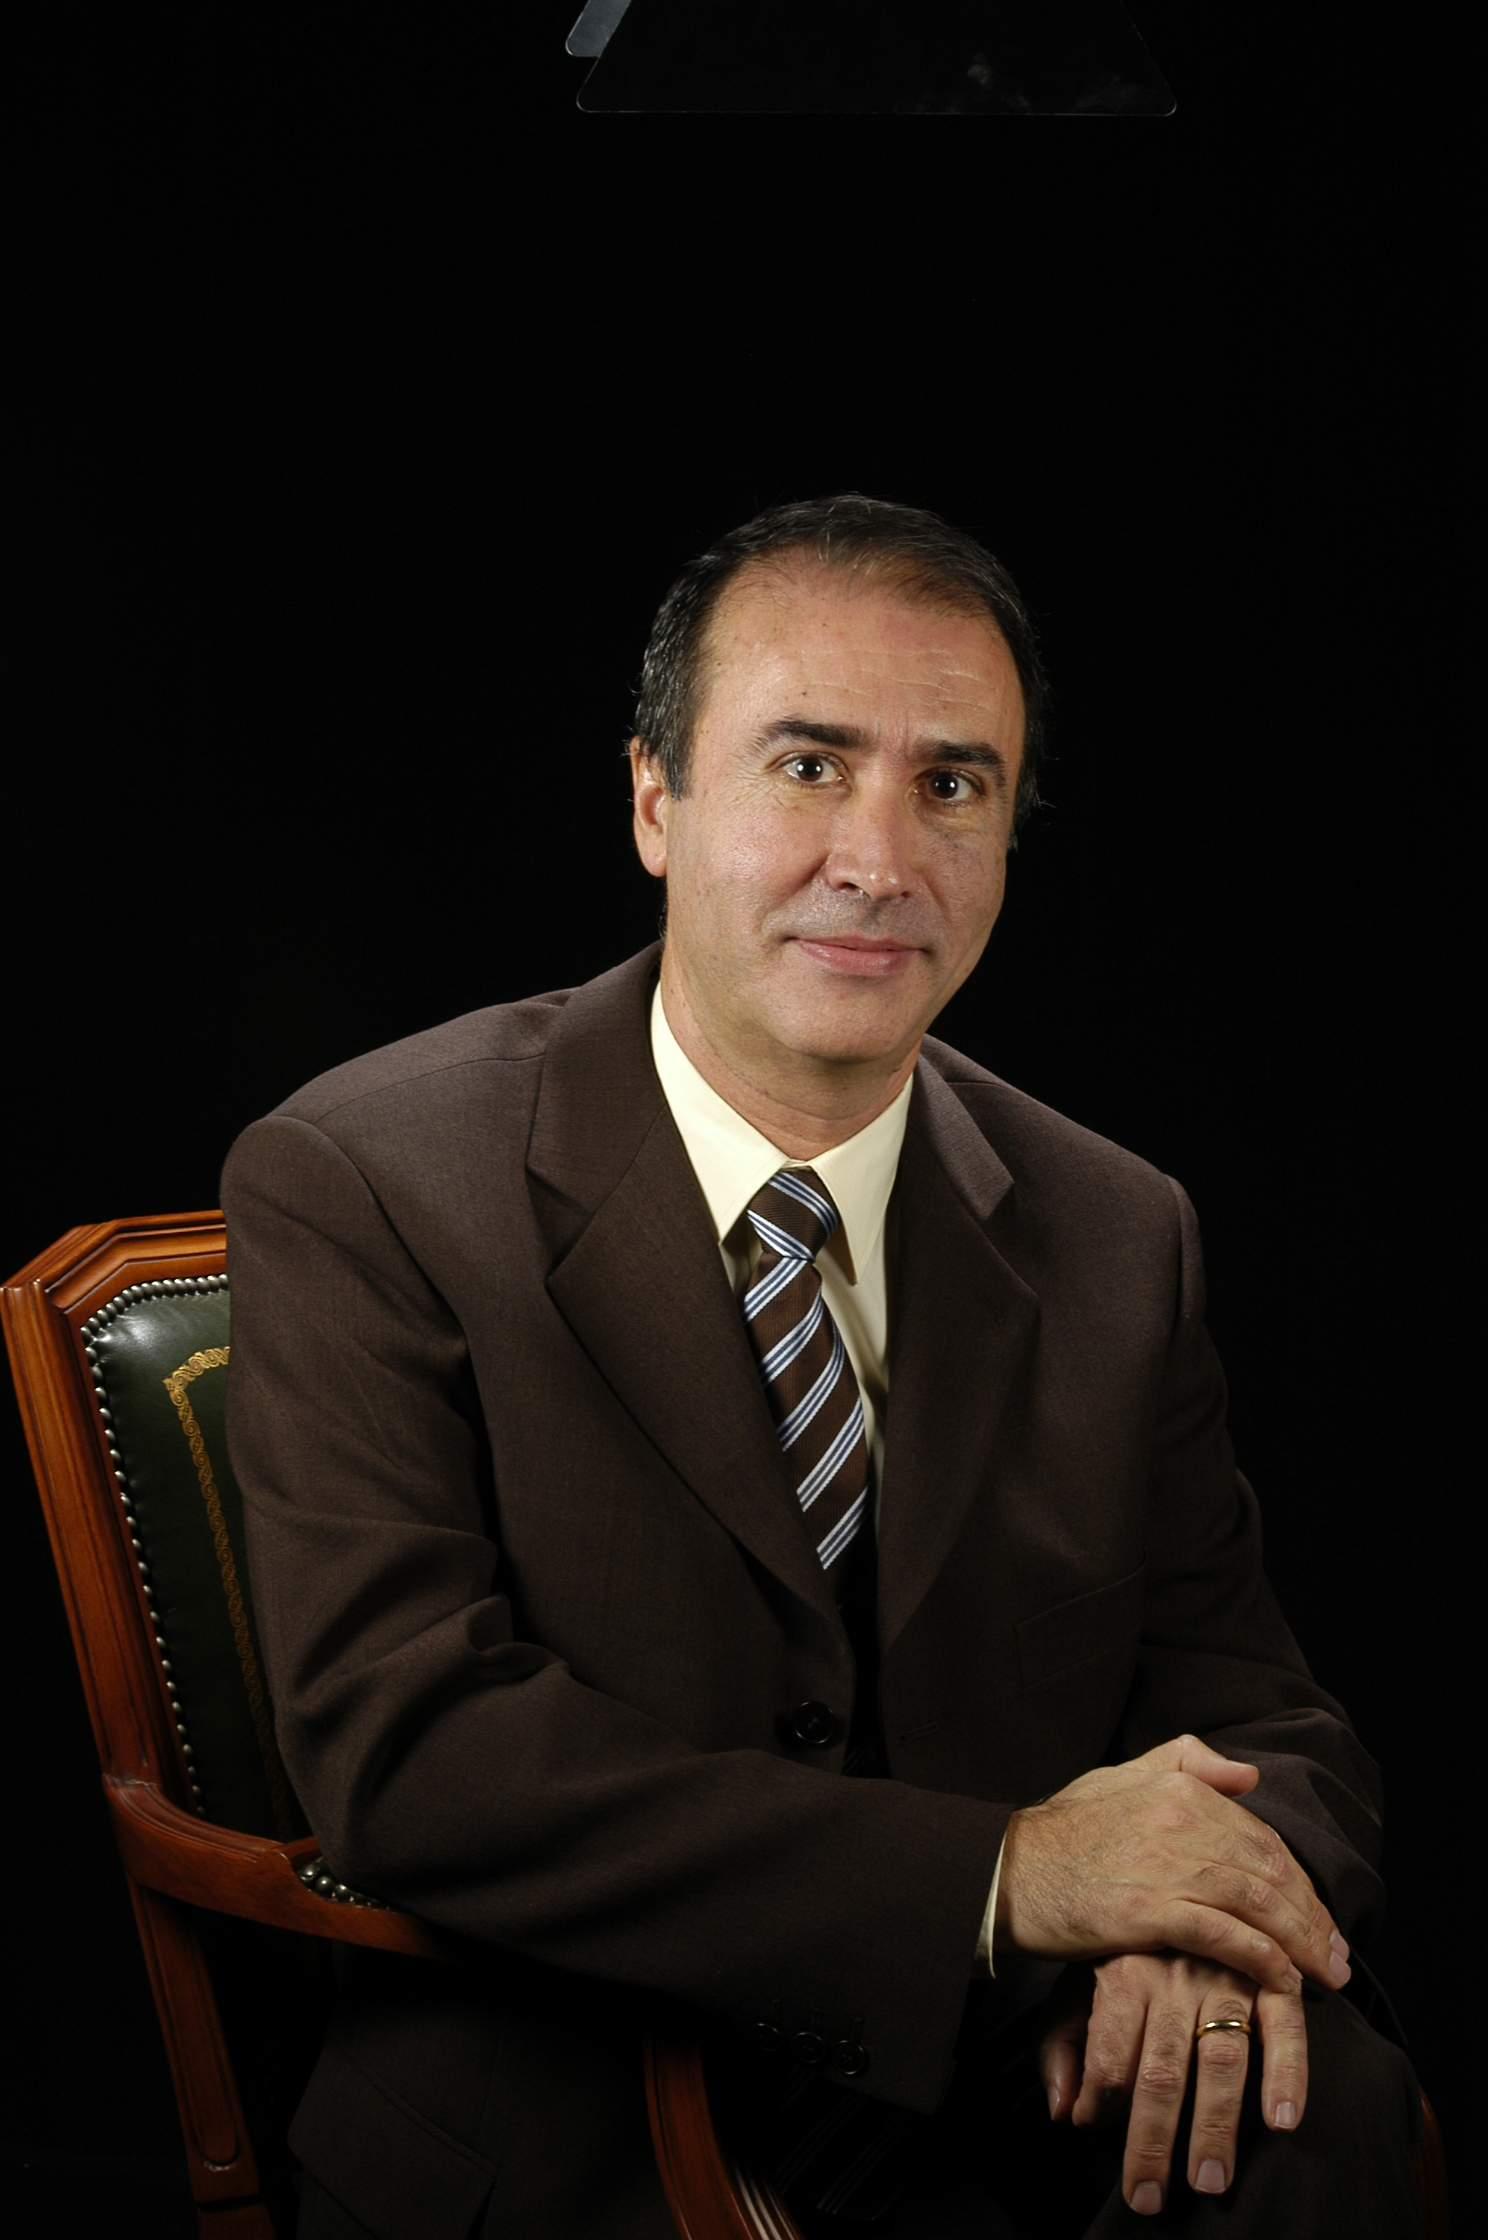 DR. JOSEP M. REÑÉ ESPINET